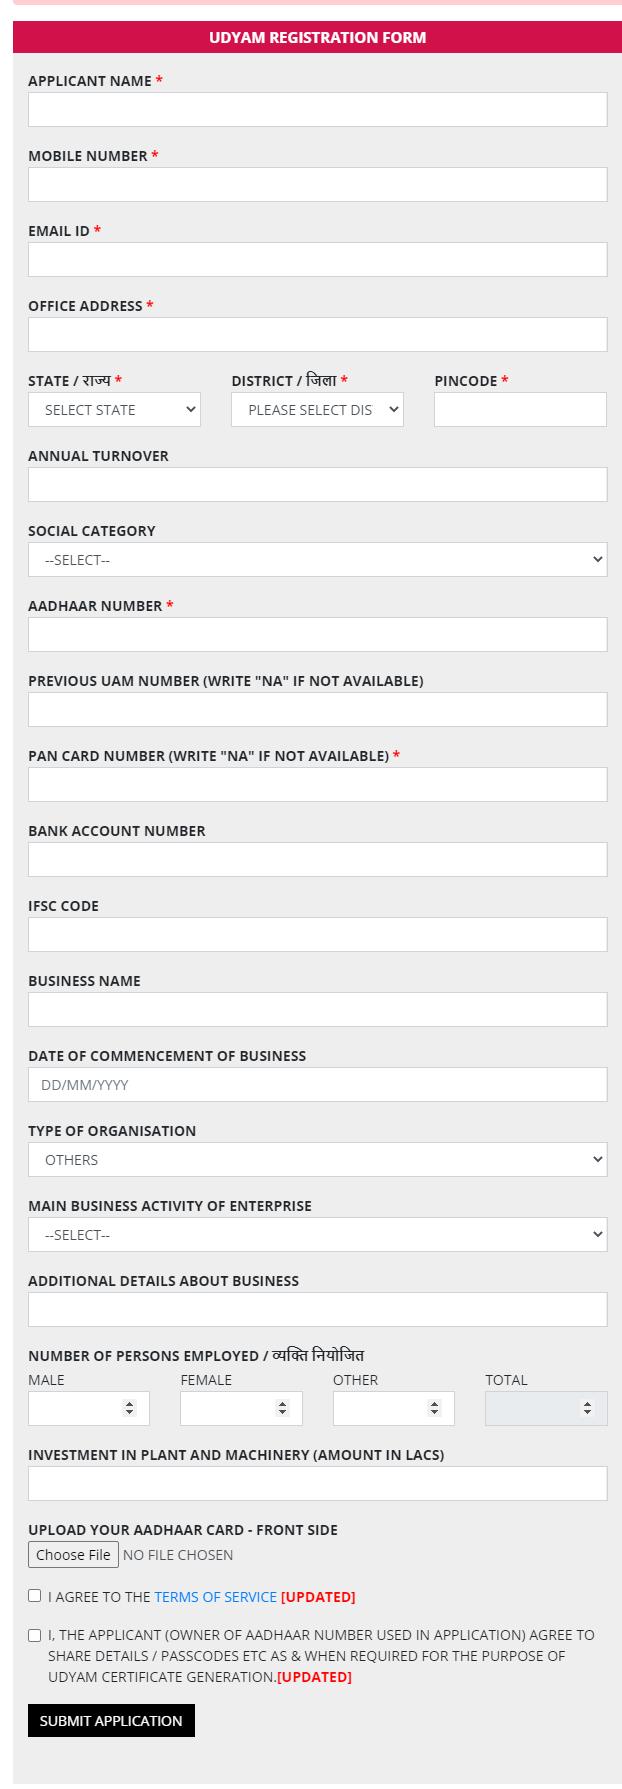 Udyam Registration Form